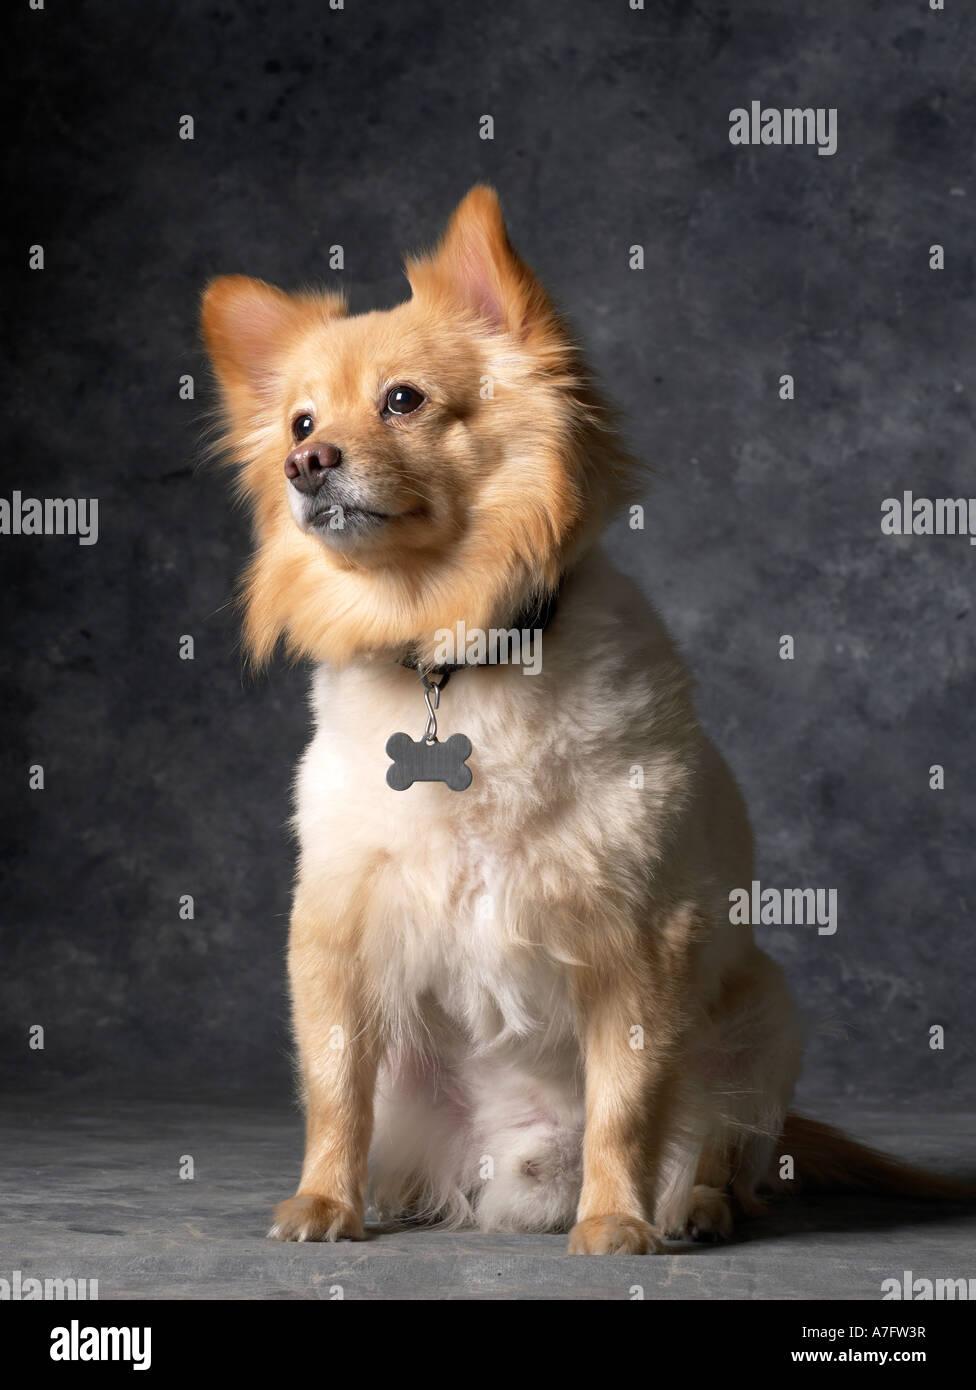 Pomeranian Dog vertical - Stock Image